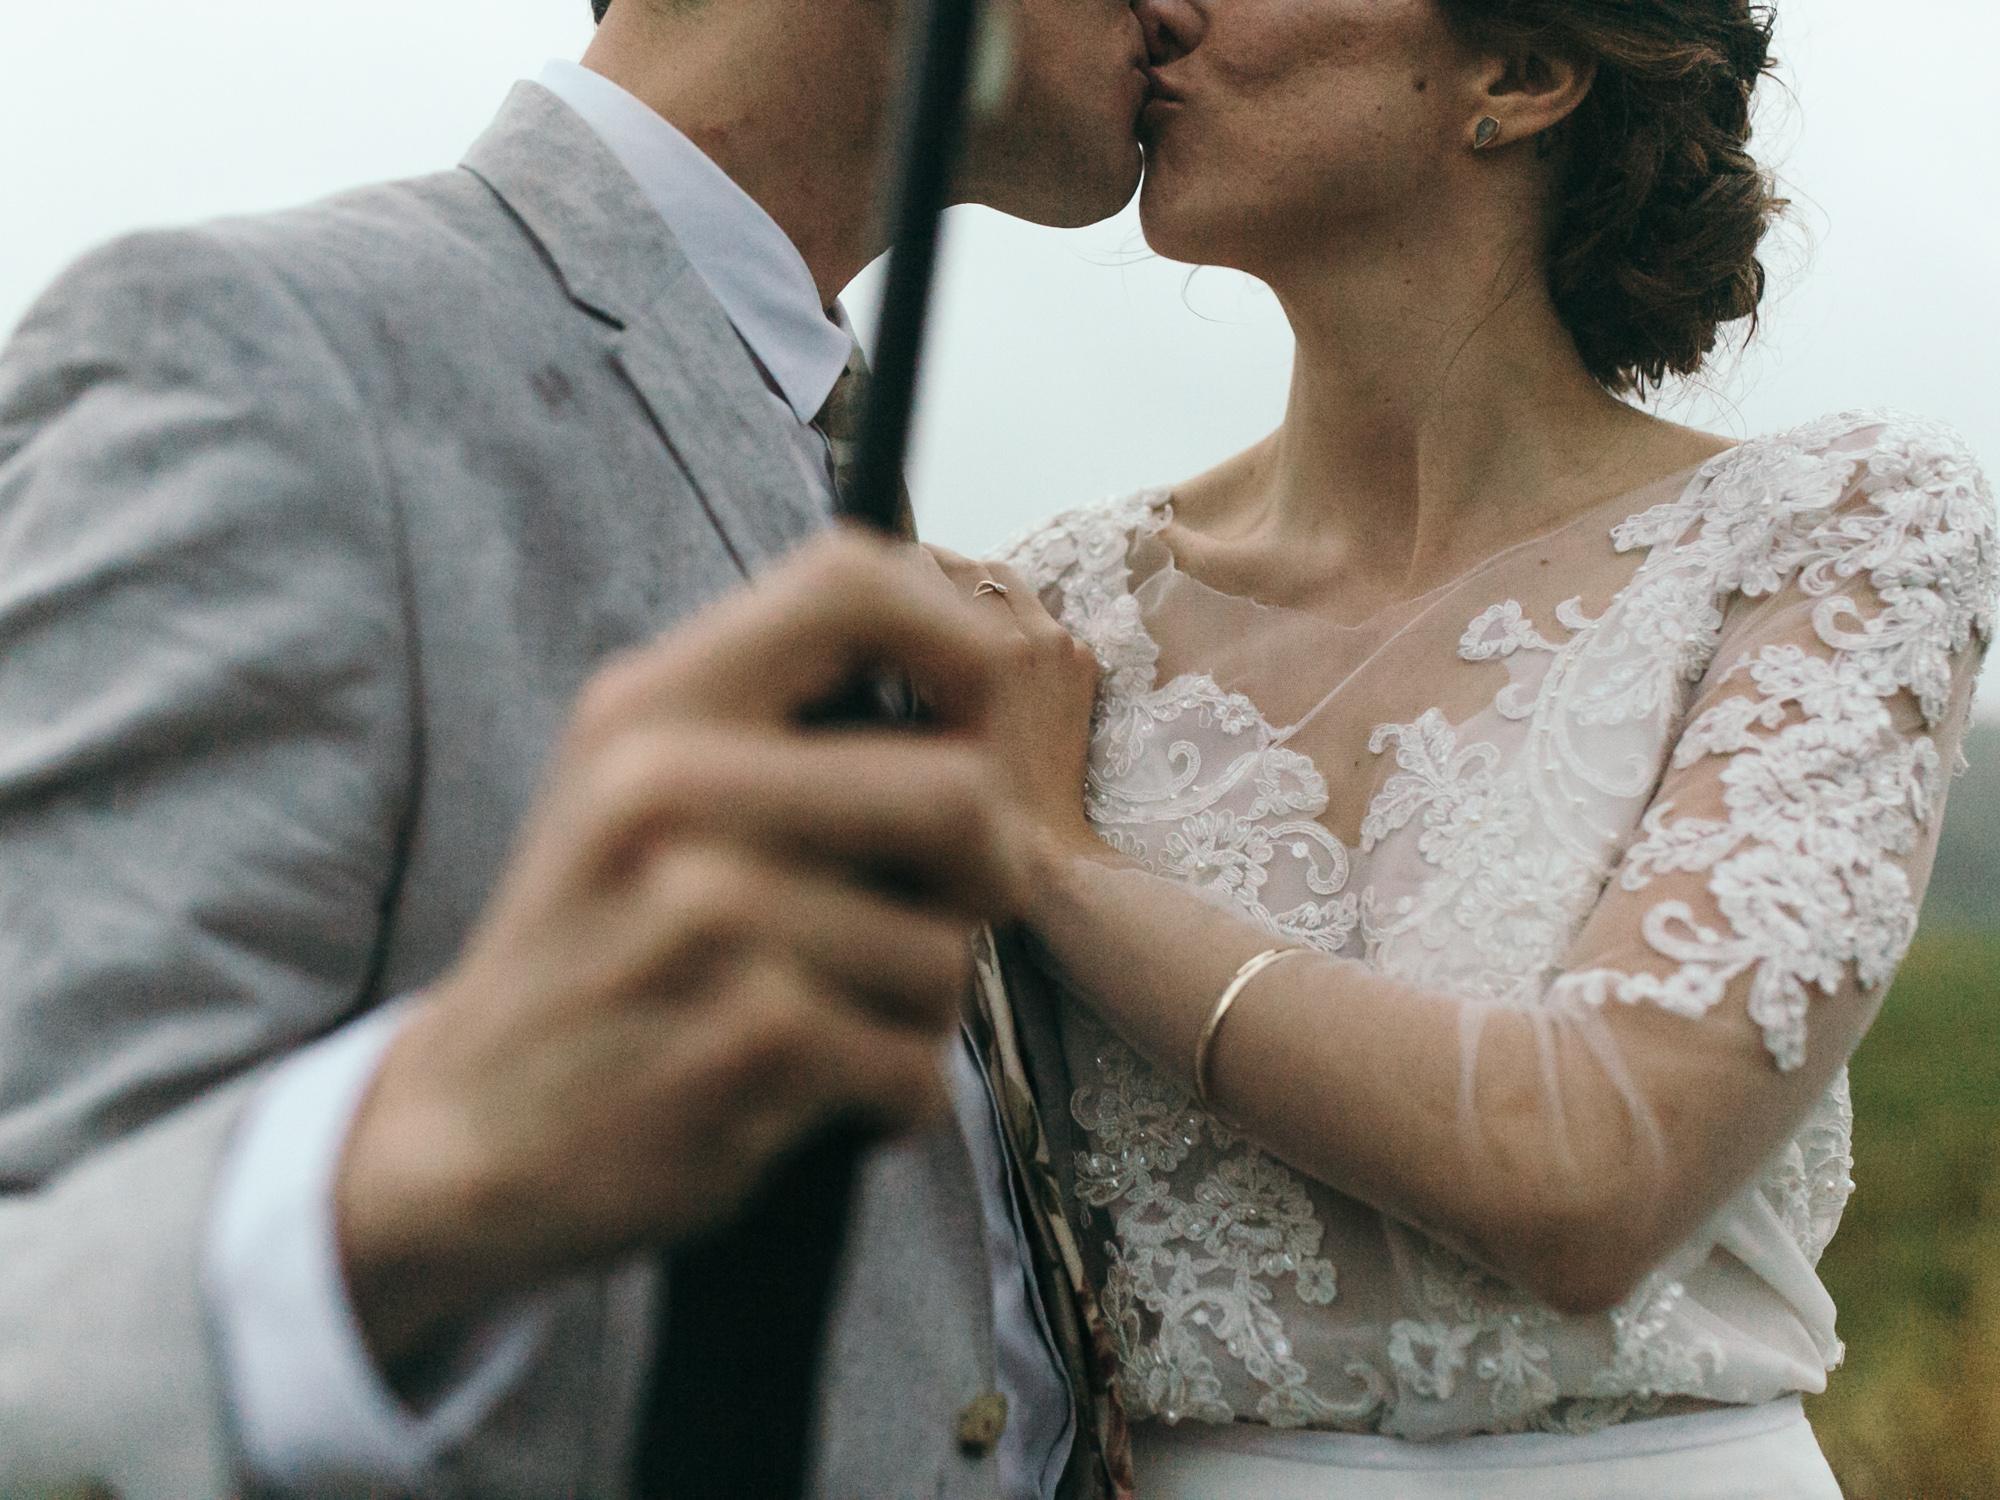 heisvisual-wedding-photographers-documentary-midlands-south-africa127.jpg